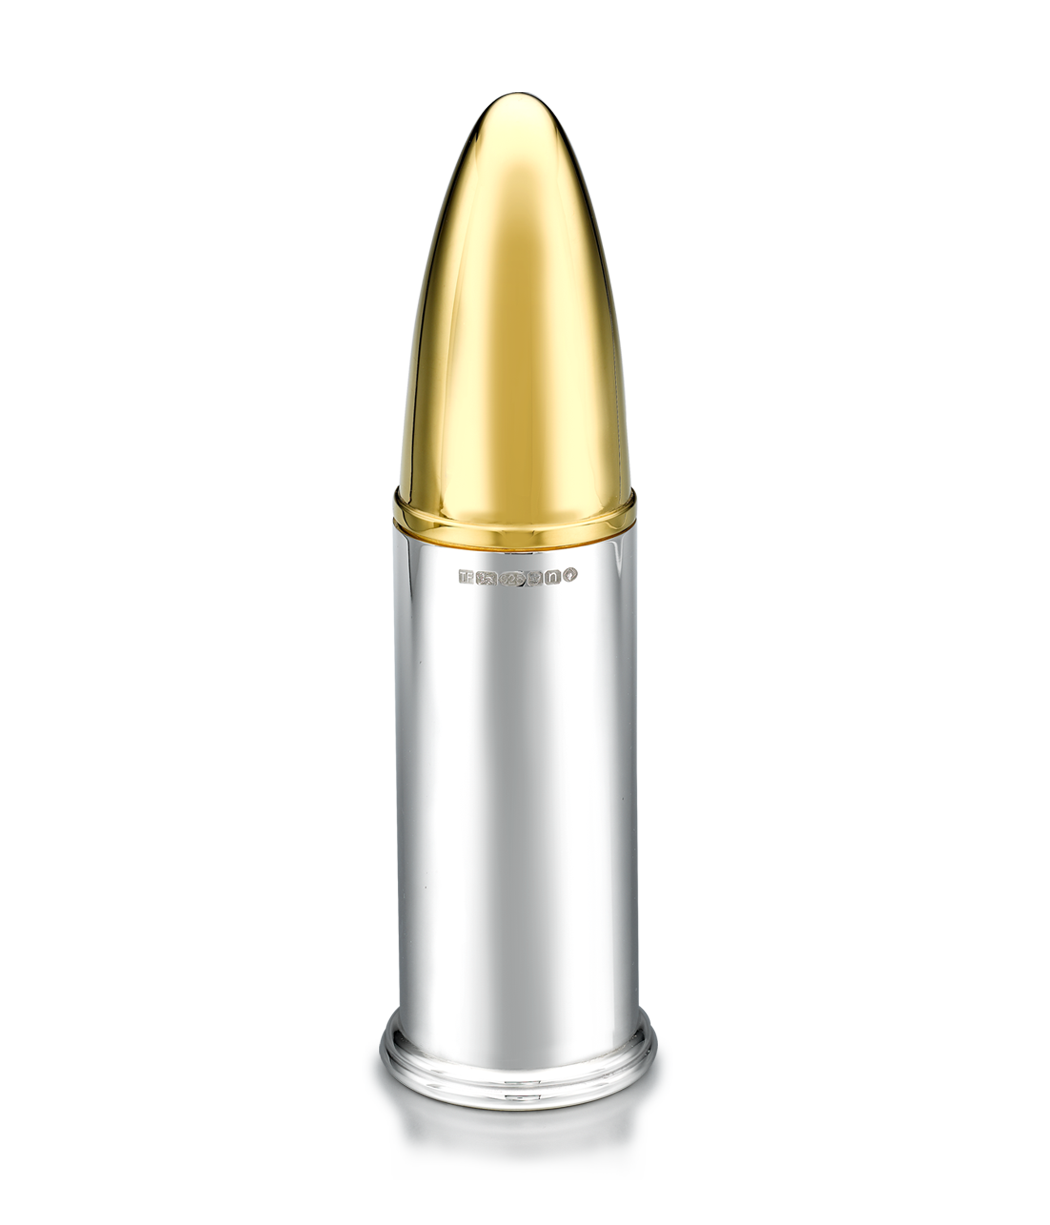 Bullet clipart clear background. Bullets png images transparent